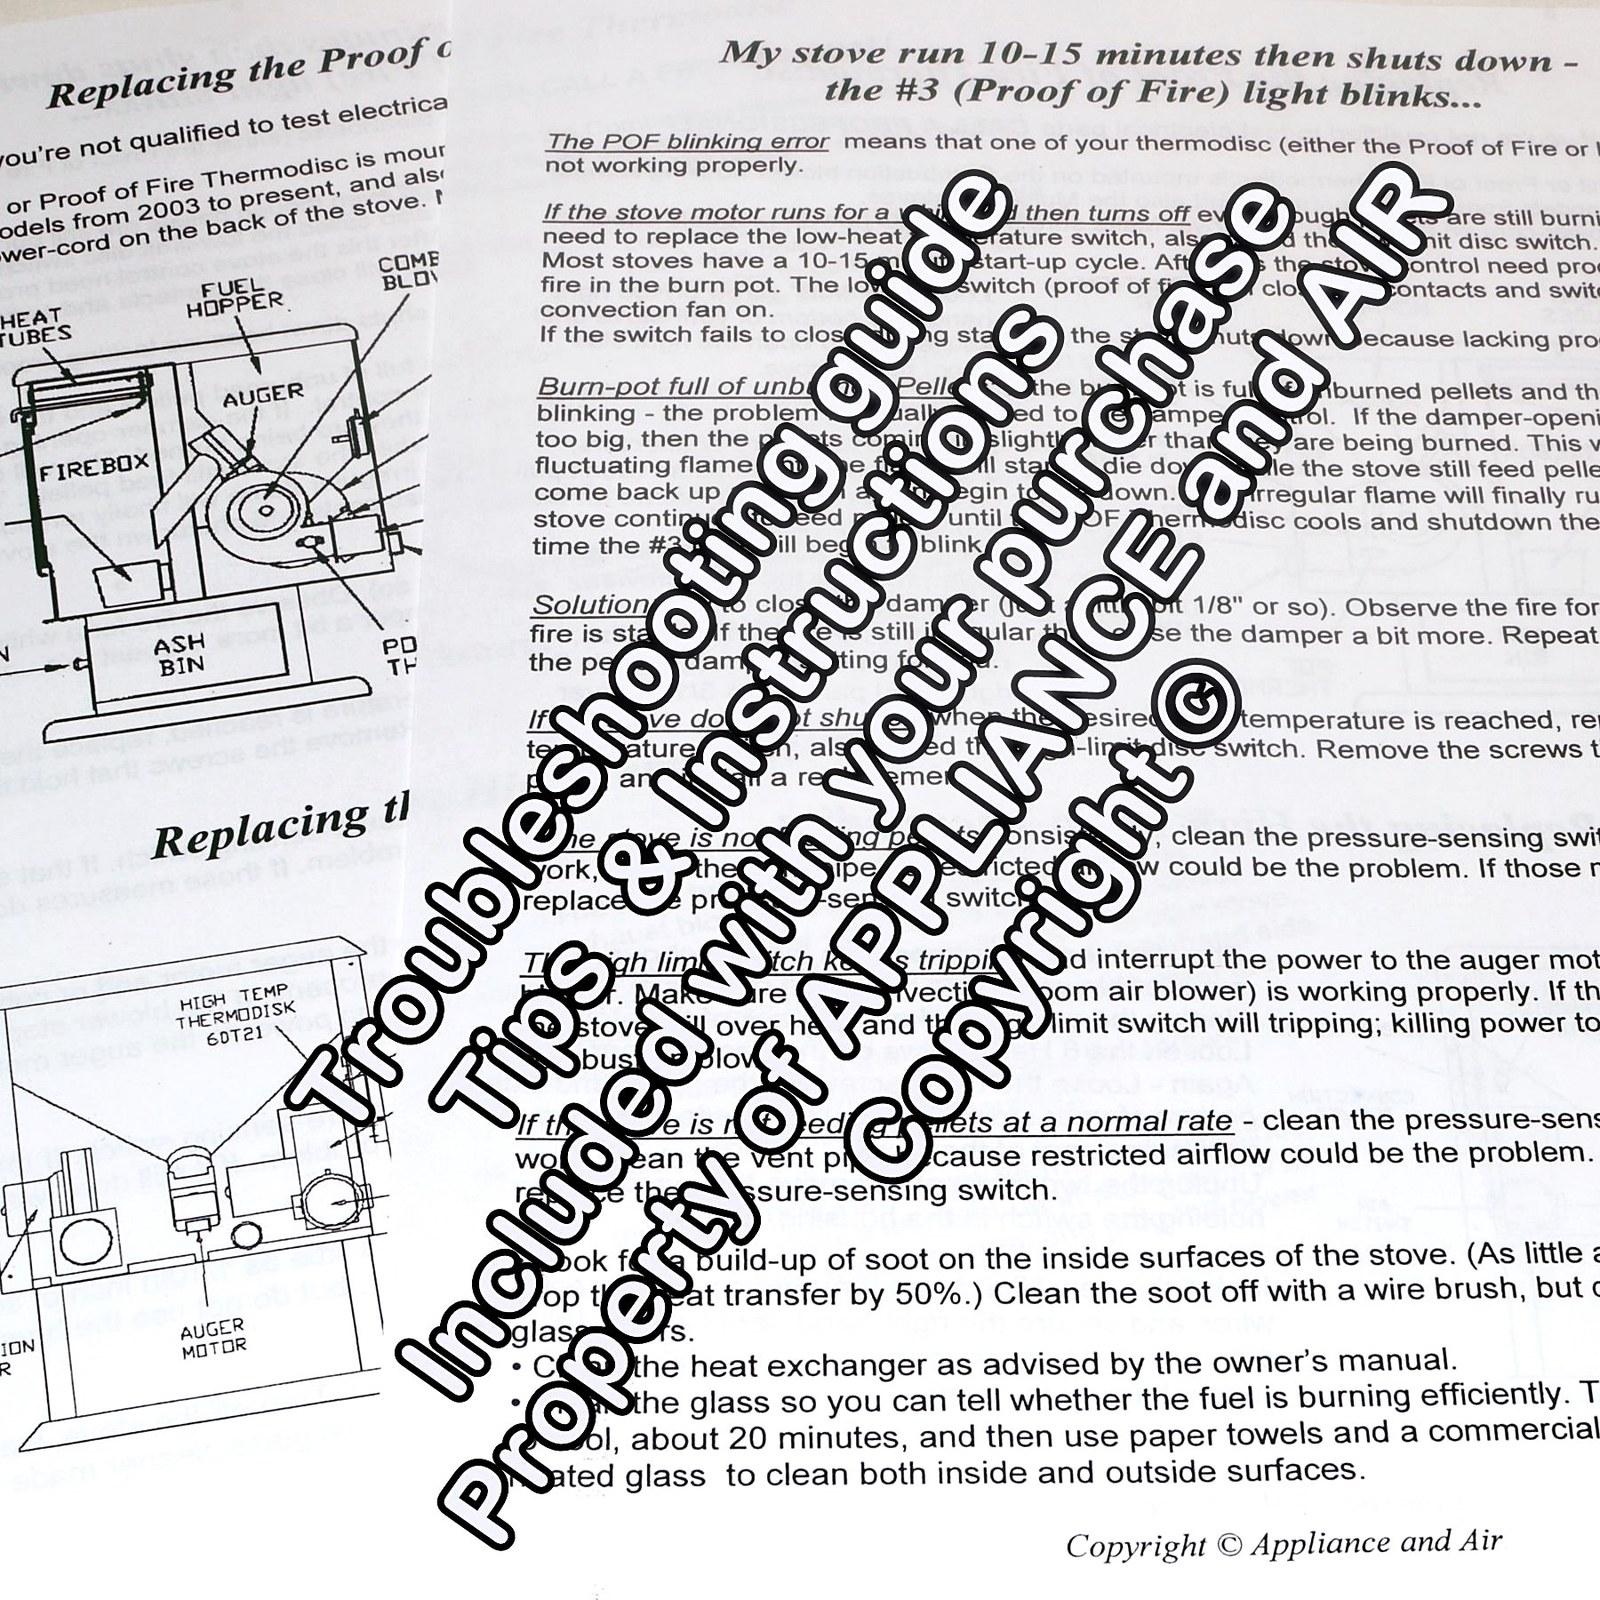 Breckwell Pellet Stove High Limit High Temp C-E-090-21 + POF C-E-090-22C +instr.